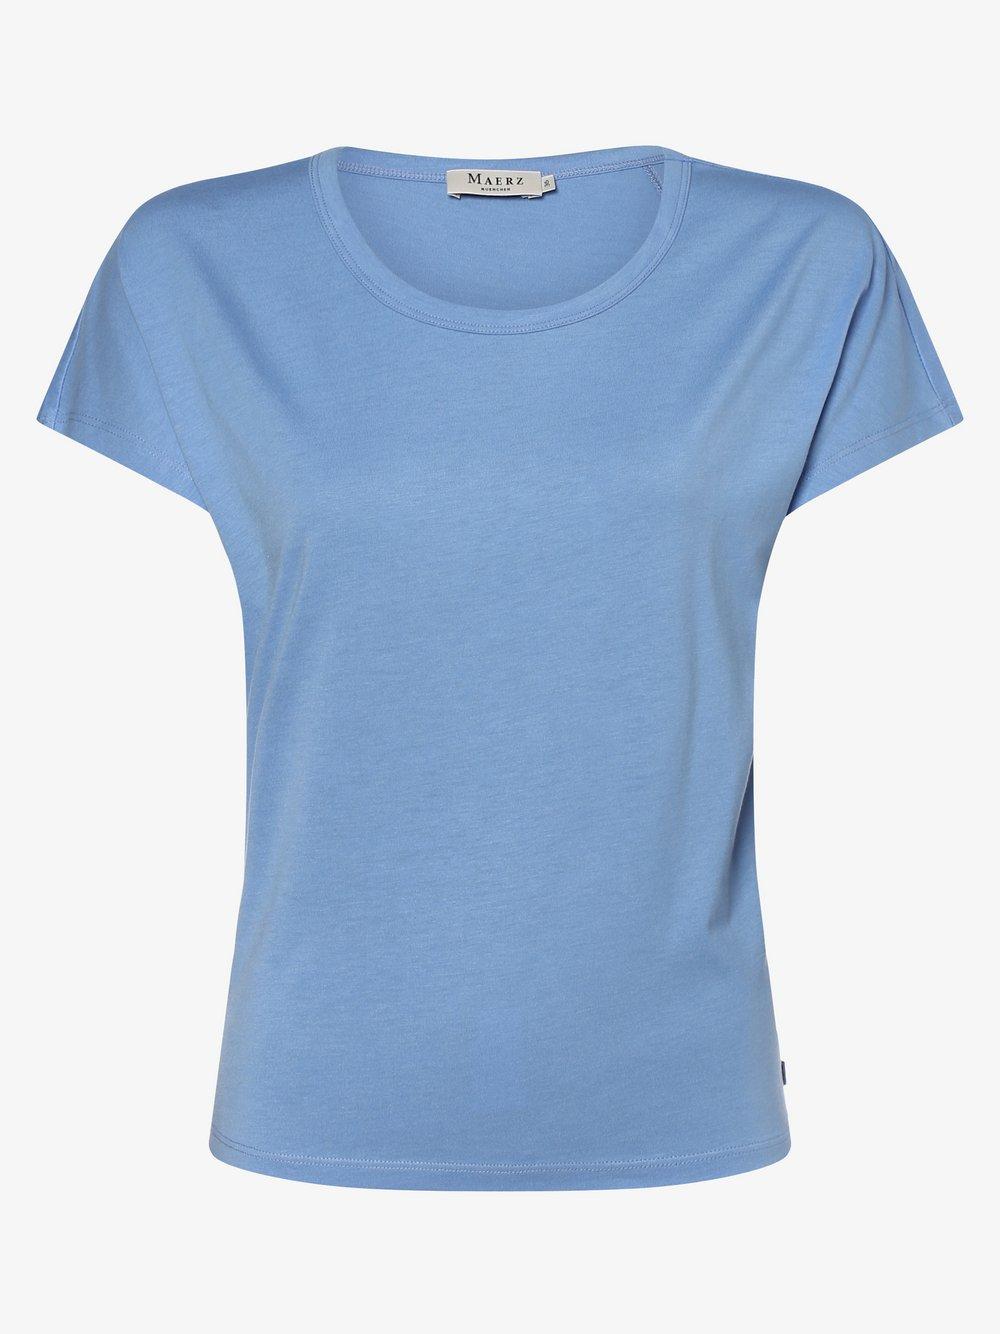 März - T-shirt damski, niebieski